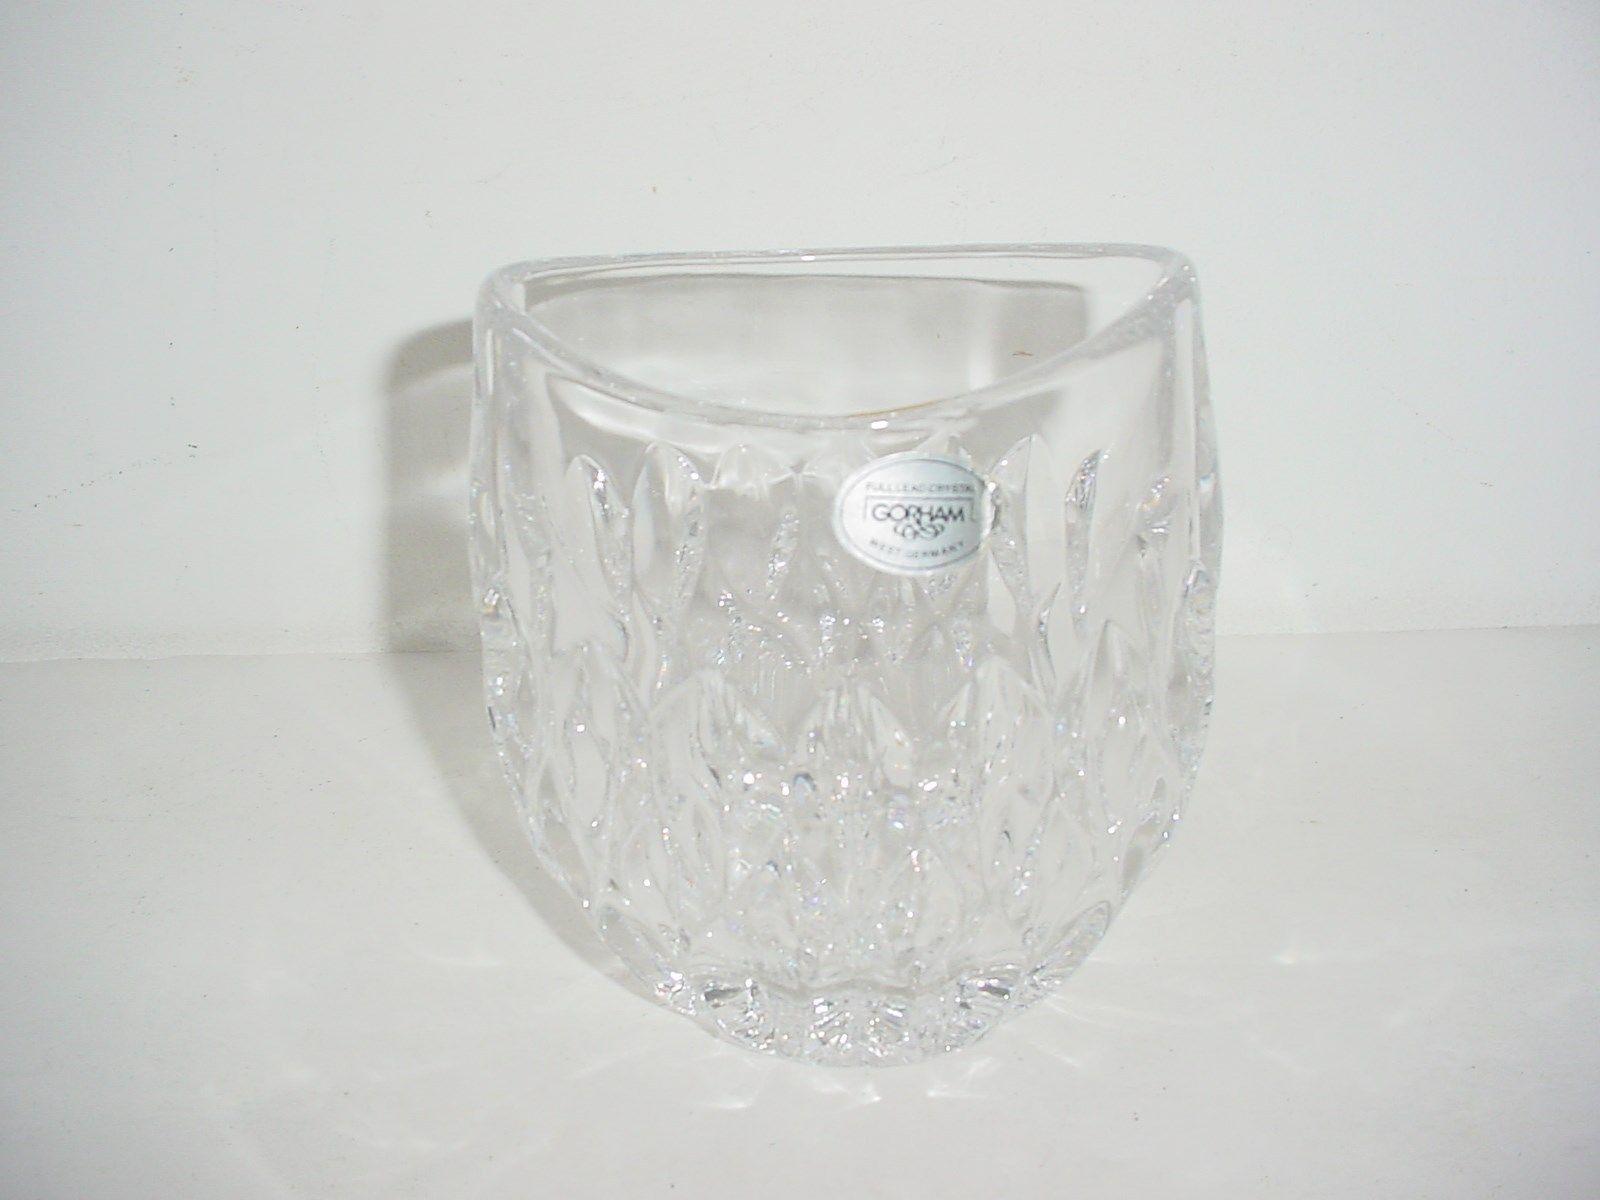 Gorham vase 8 listings gorham full lead crystal vase west germany 985 reviewsmspy